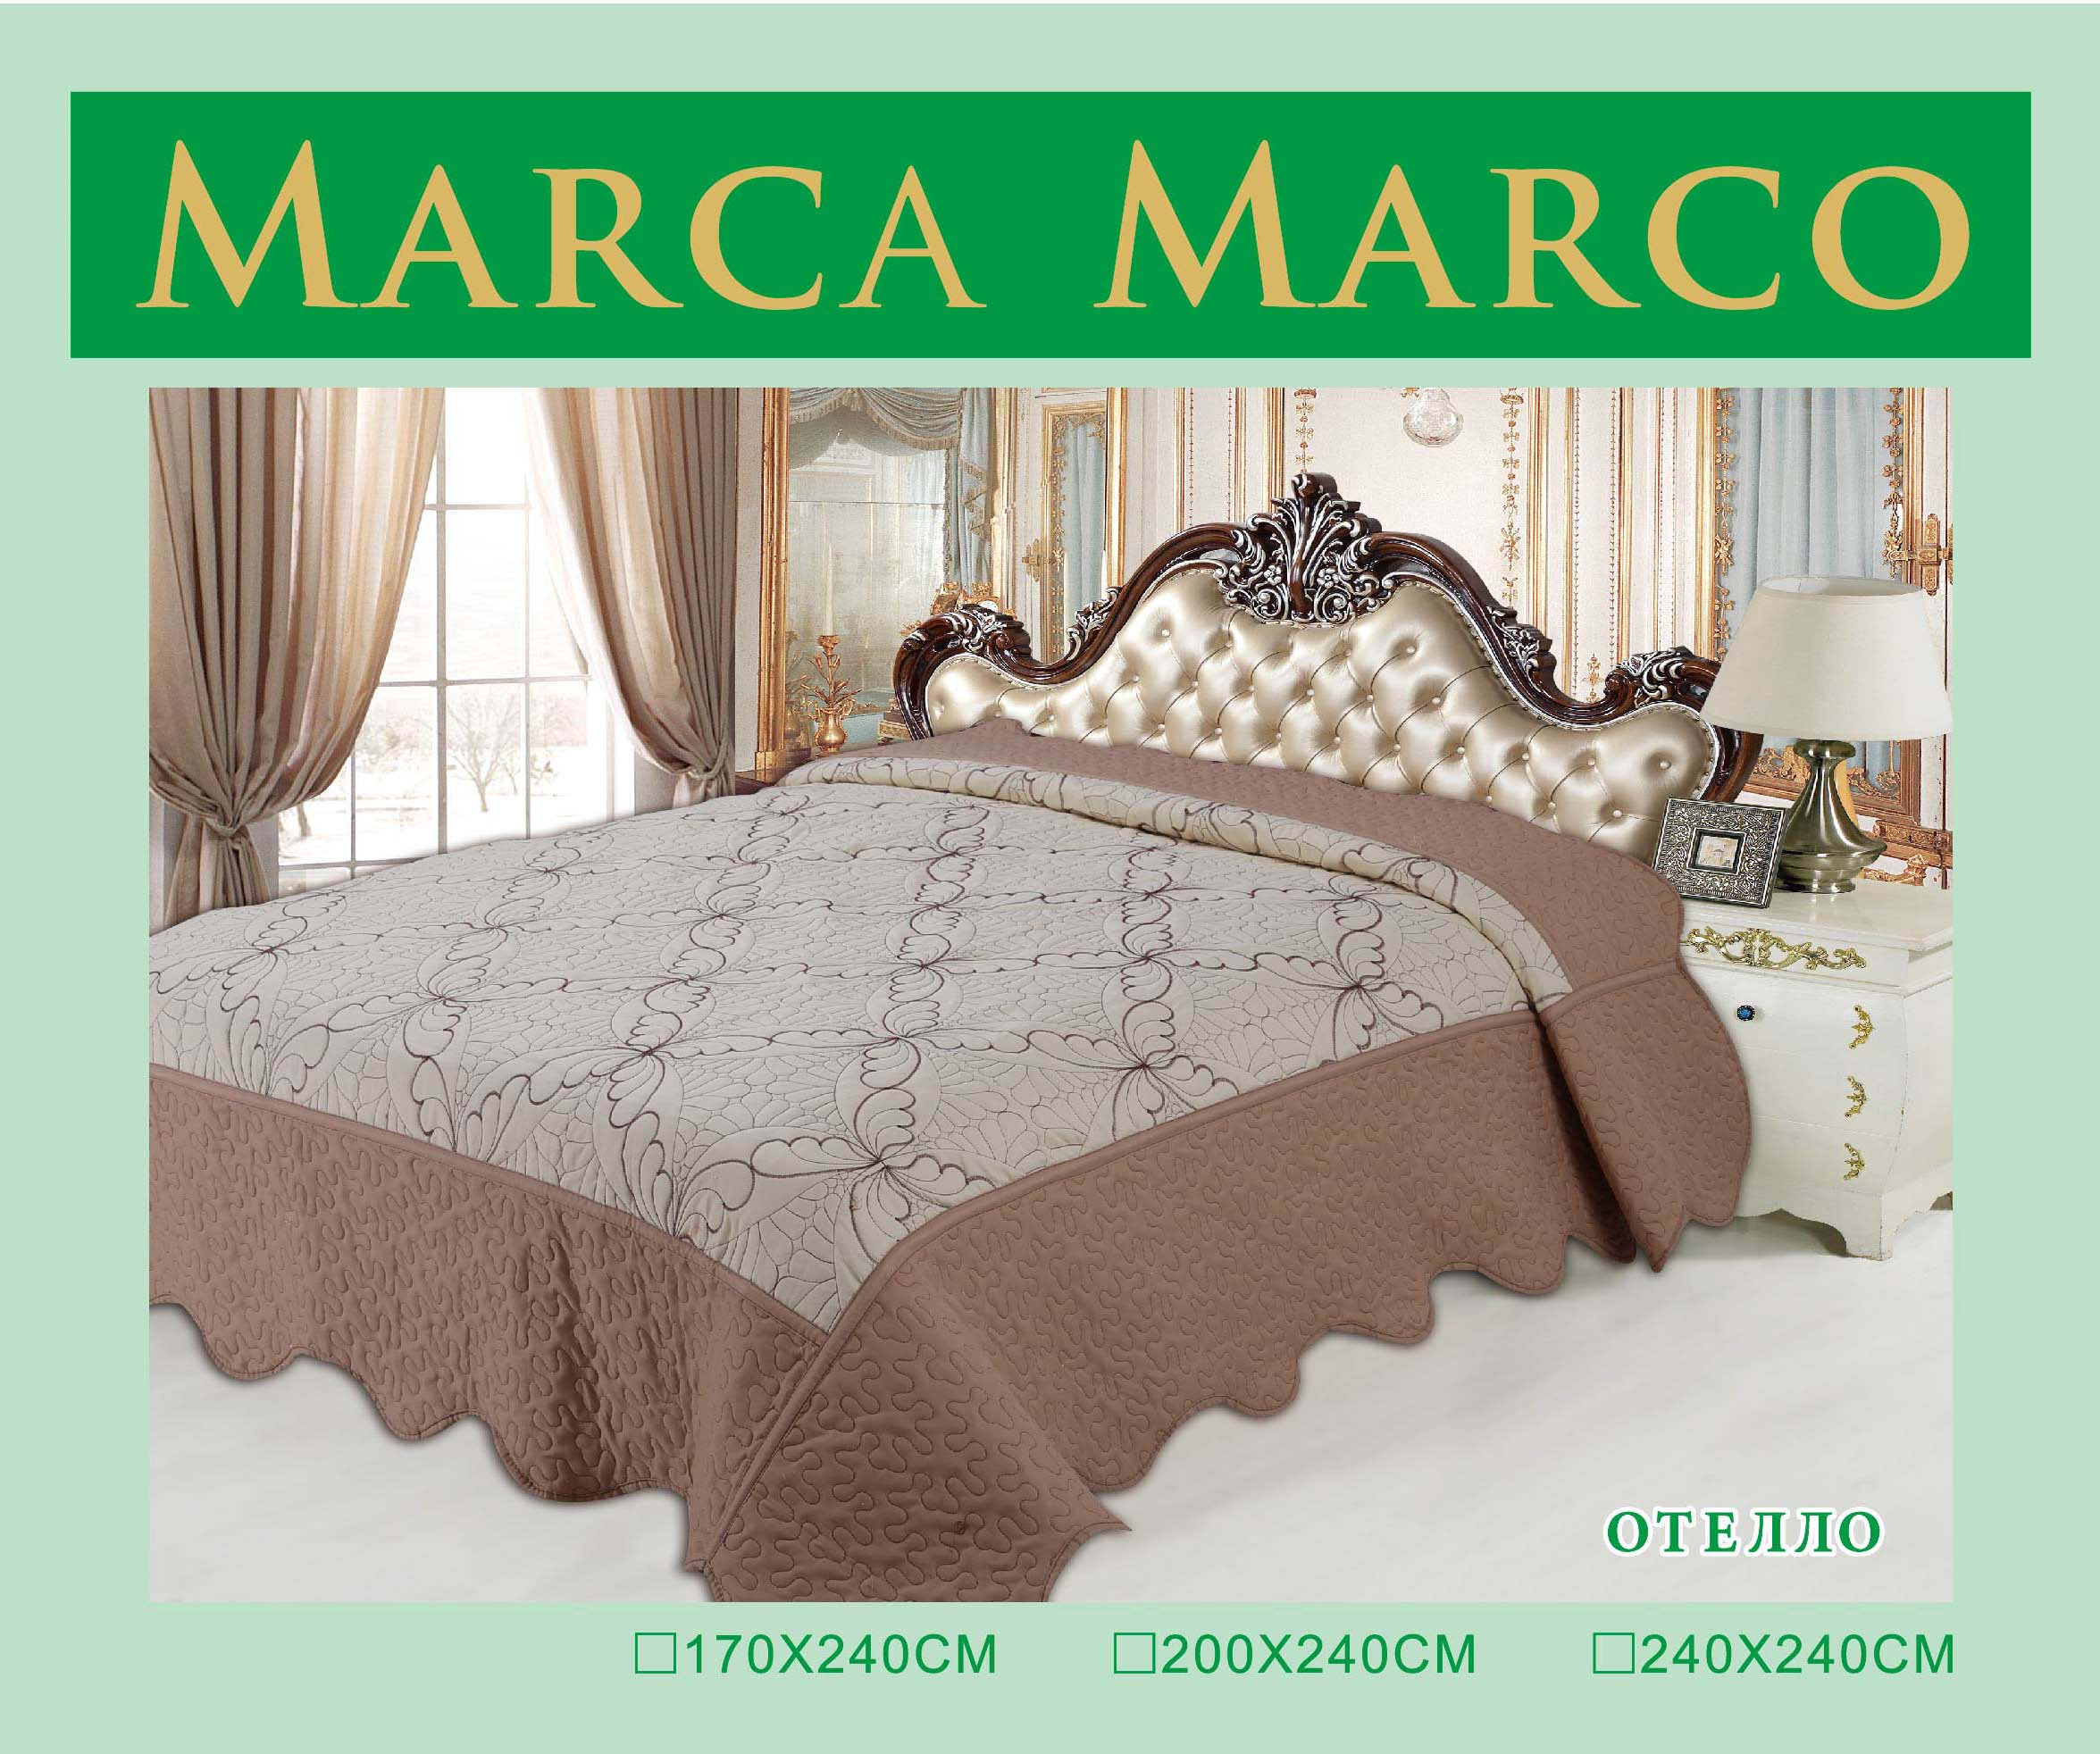 Покрывало MАRCA MARCO Покрывало Отелло (170х240 см) dorothy s нome покрывало принт мурманск 2 сп 170х240 микрофибра стежка